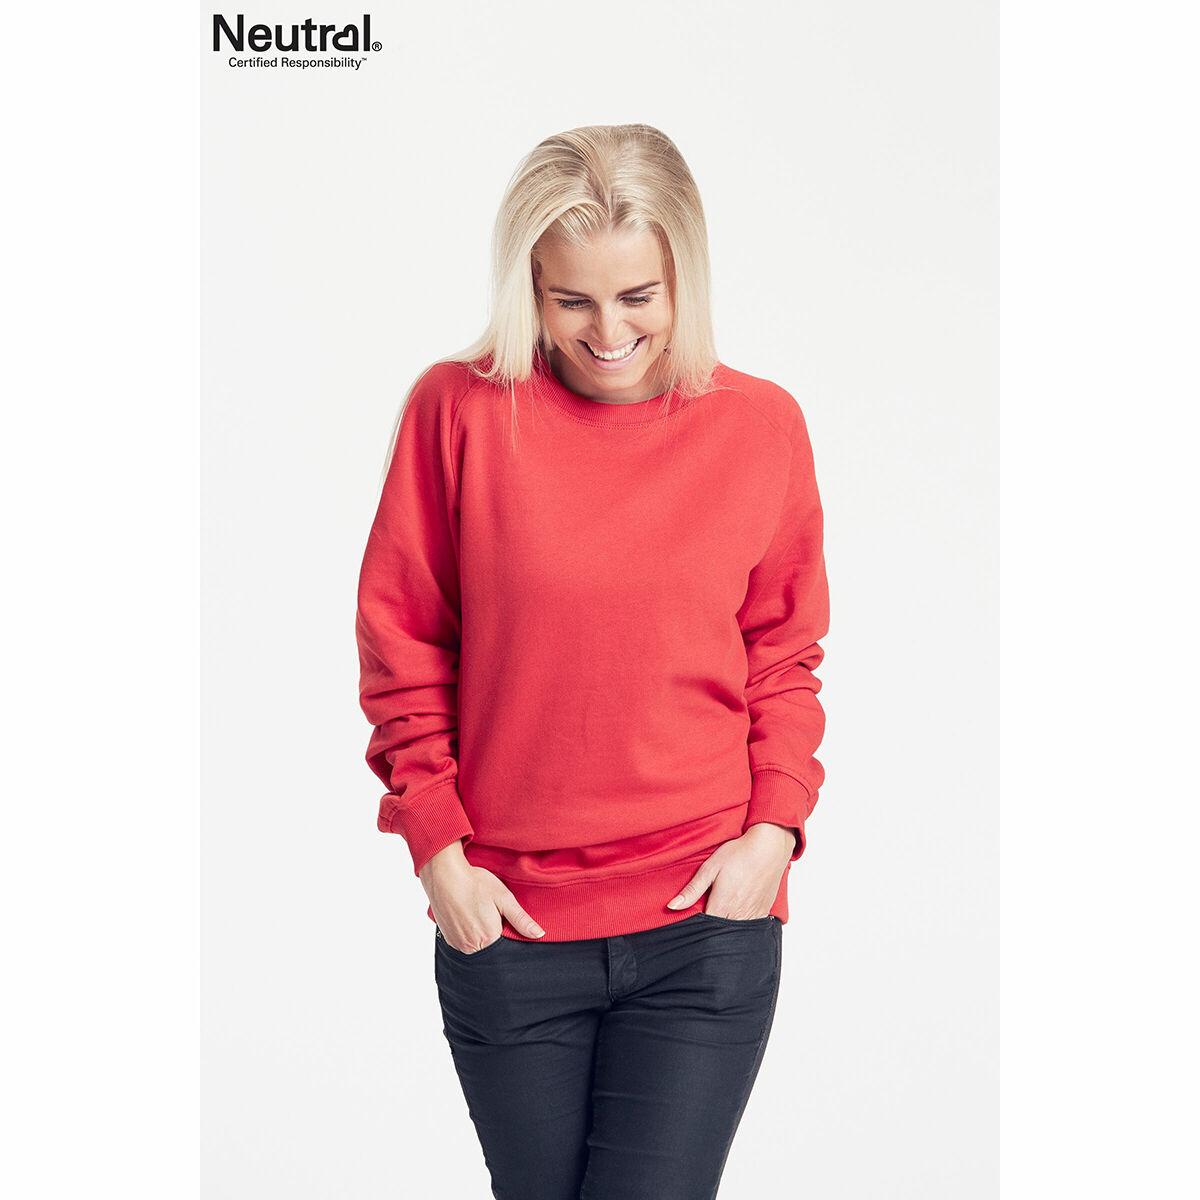 Neutral Organic Unisex Sweatshirt Red